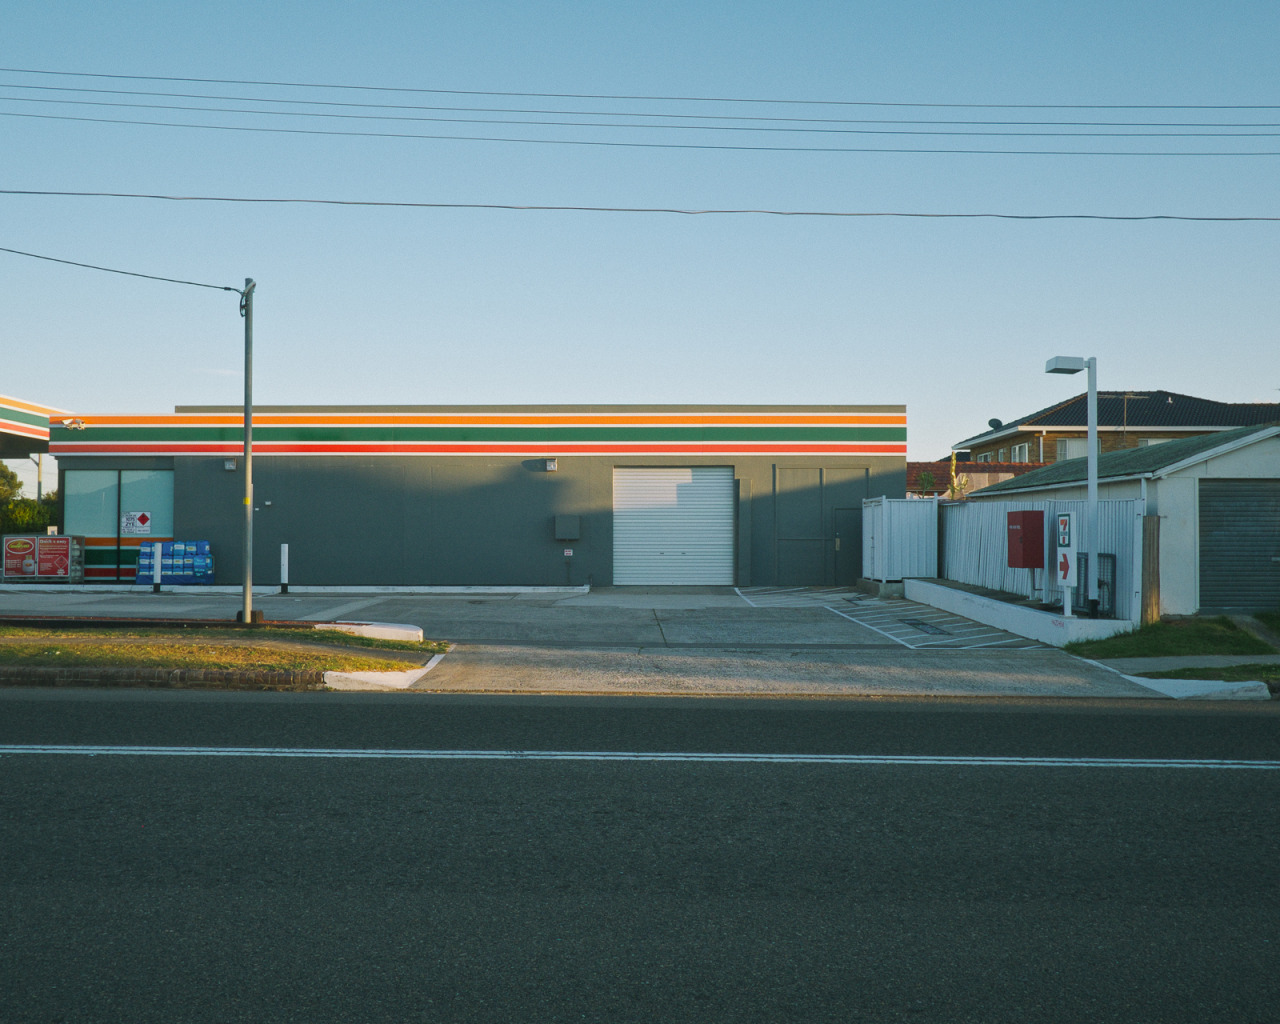 #suburbia #banksia #sydney #documentingspace